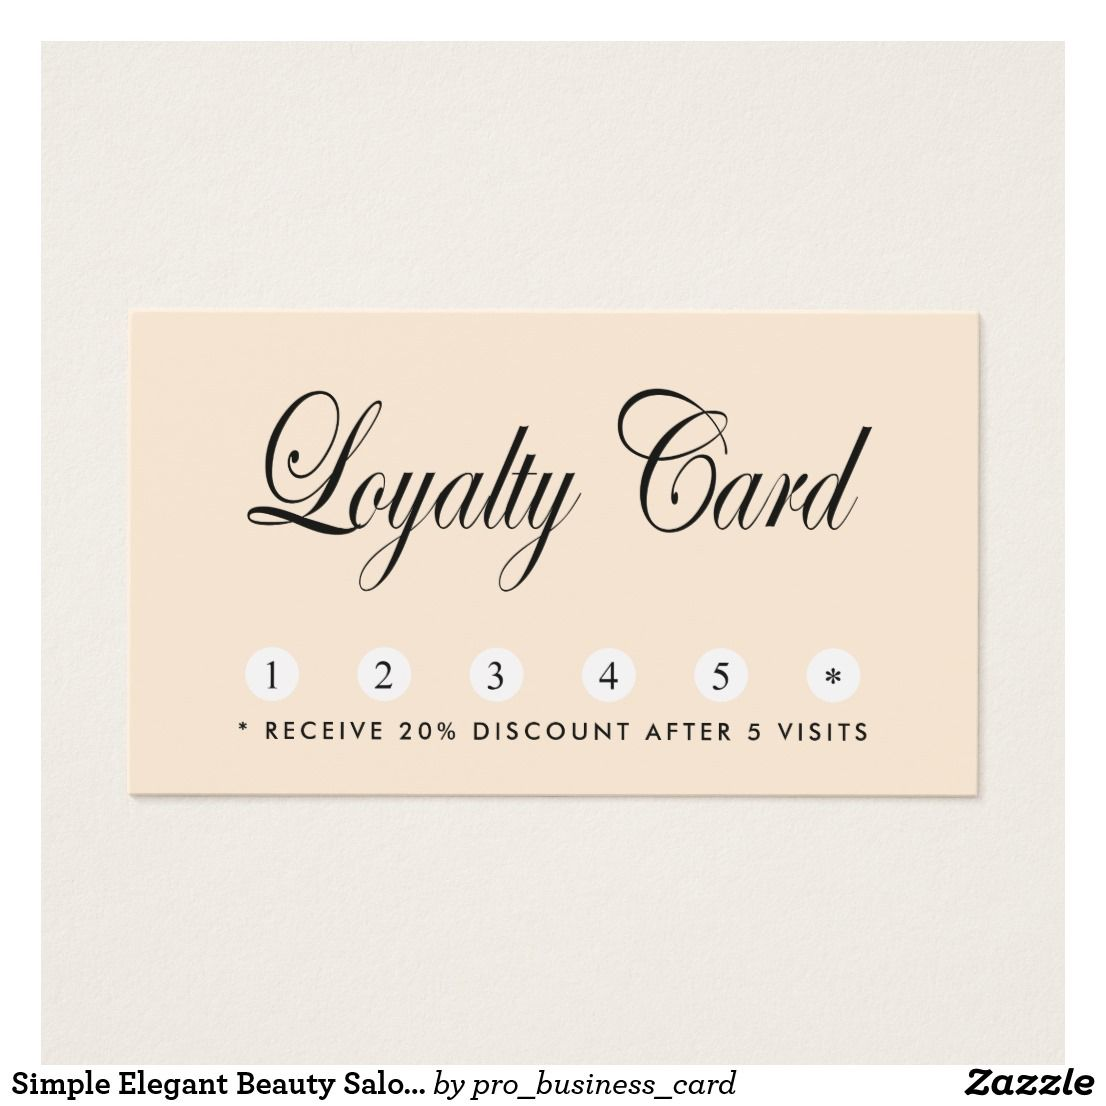 Simple Elegant Beauty Salon Loyalty Card Zazzle Com Loyalty Card Design Loyalty Card Printing Double Sided